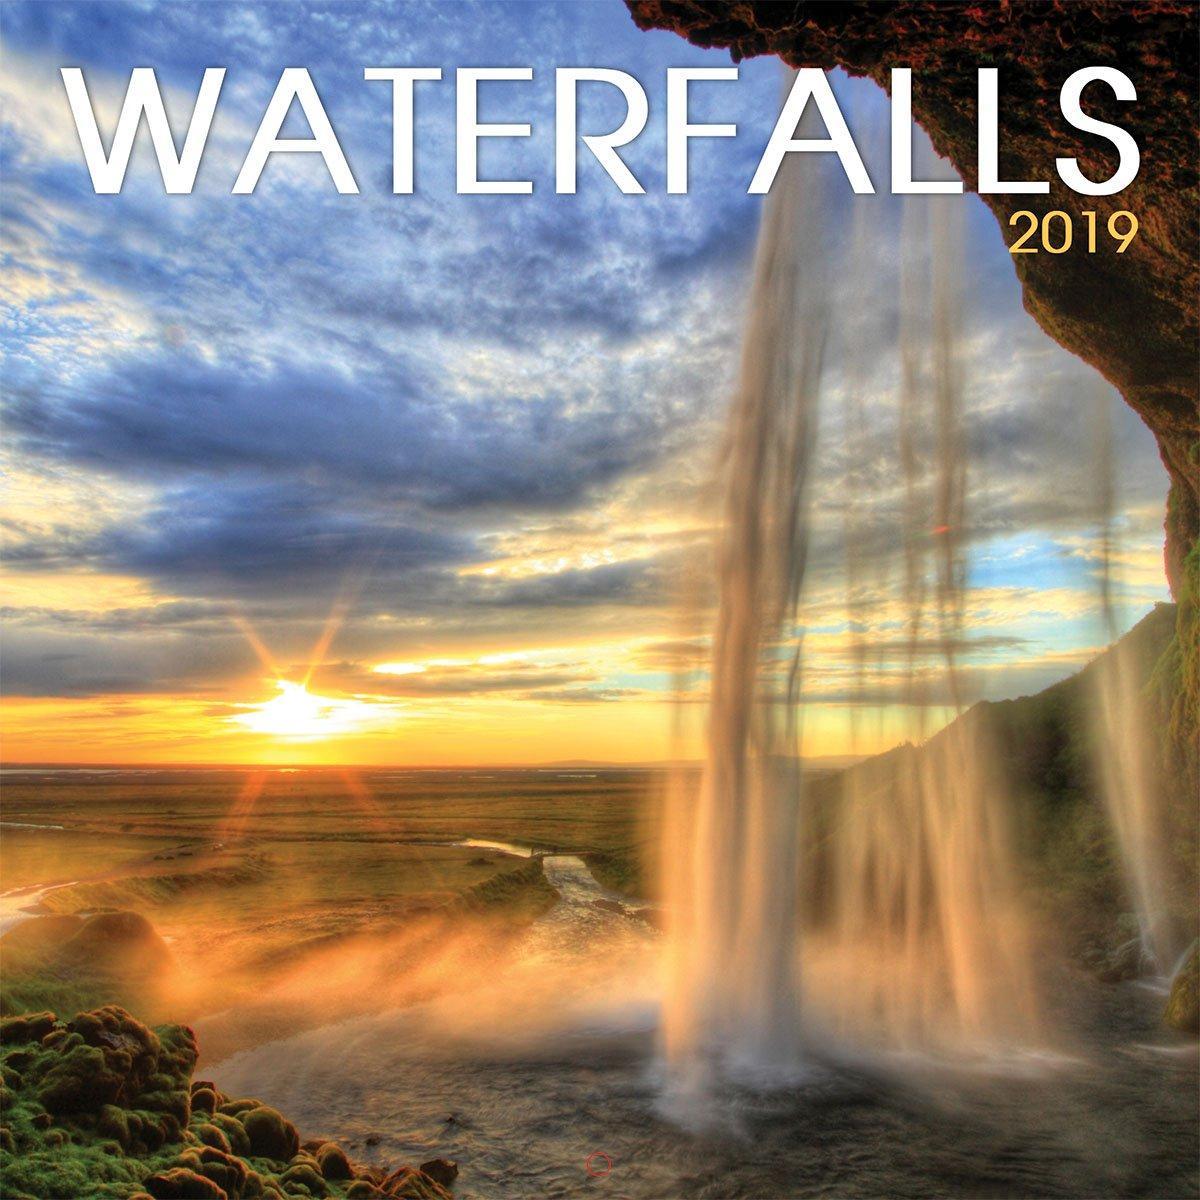 Turner Photo Waterfalls 2019 Wall Calendar (199980273120 Office Wall Calendar (19998027312)